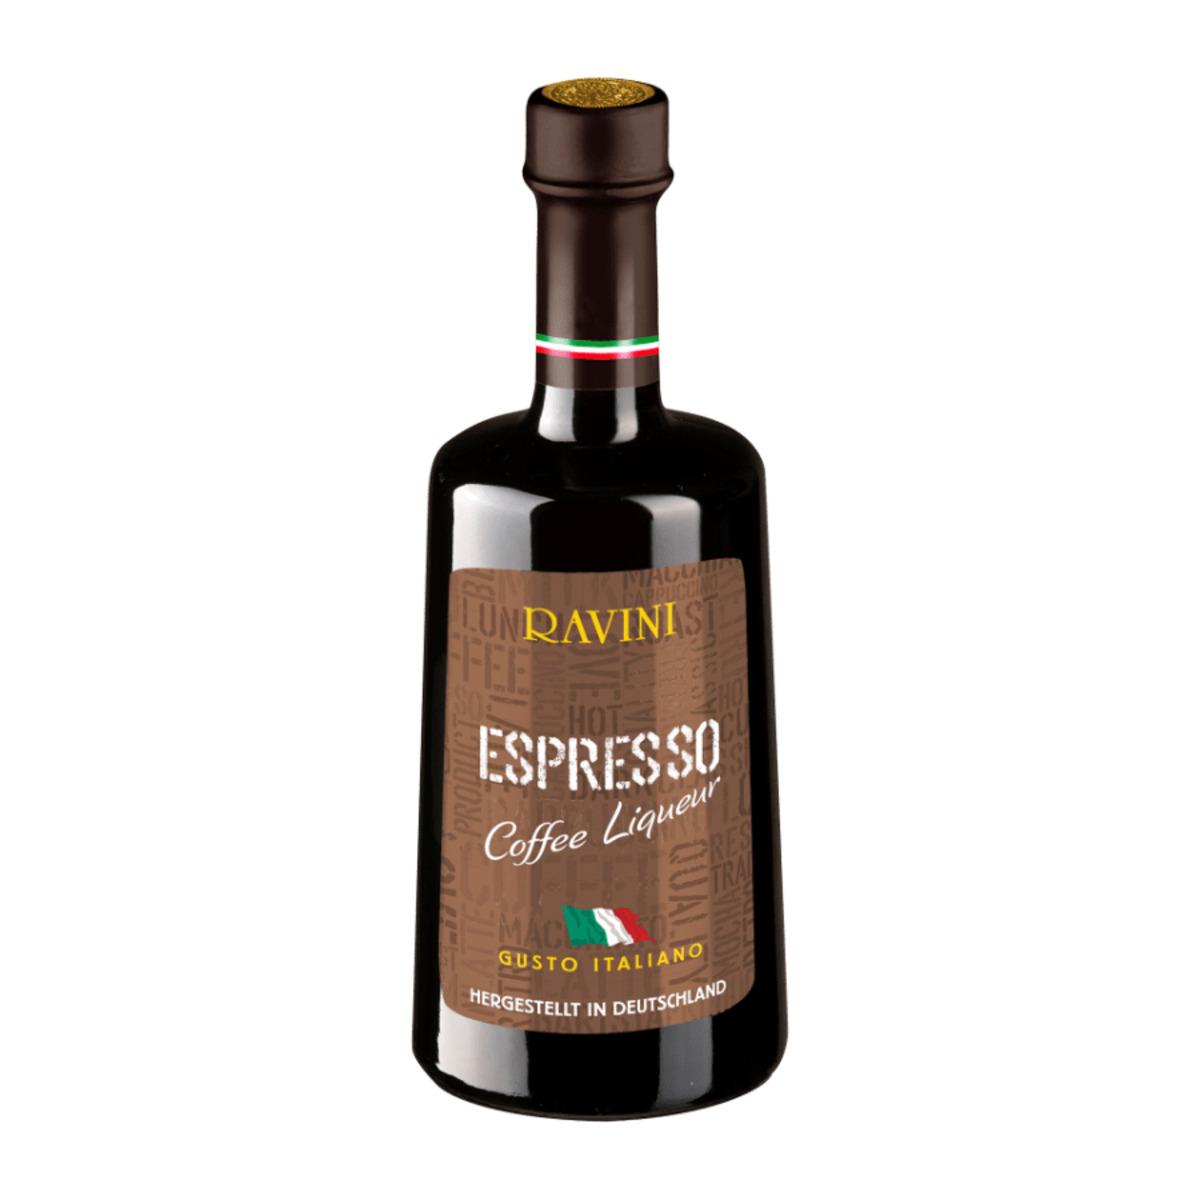 Bild 3 von RAVINI     Coffee Liqueur